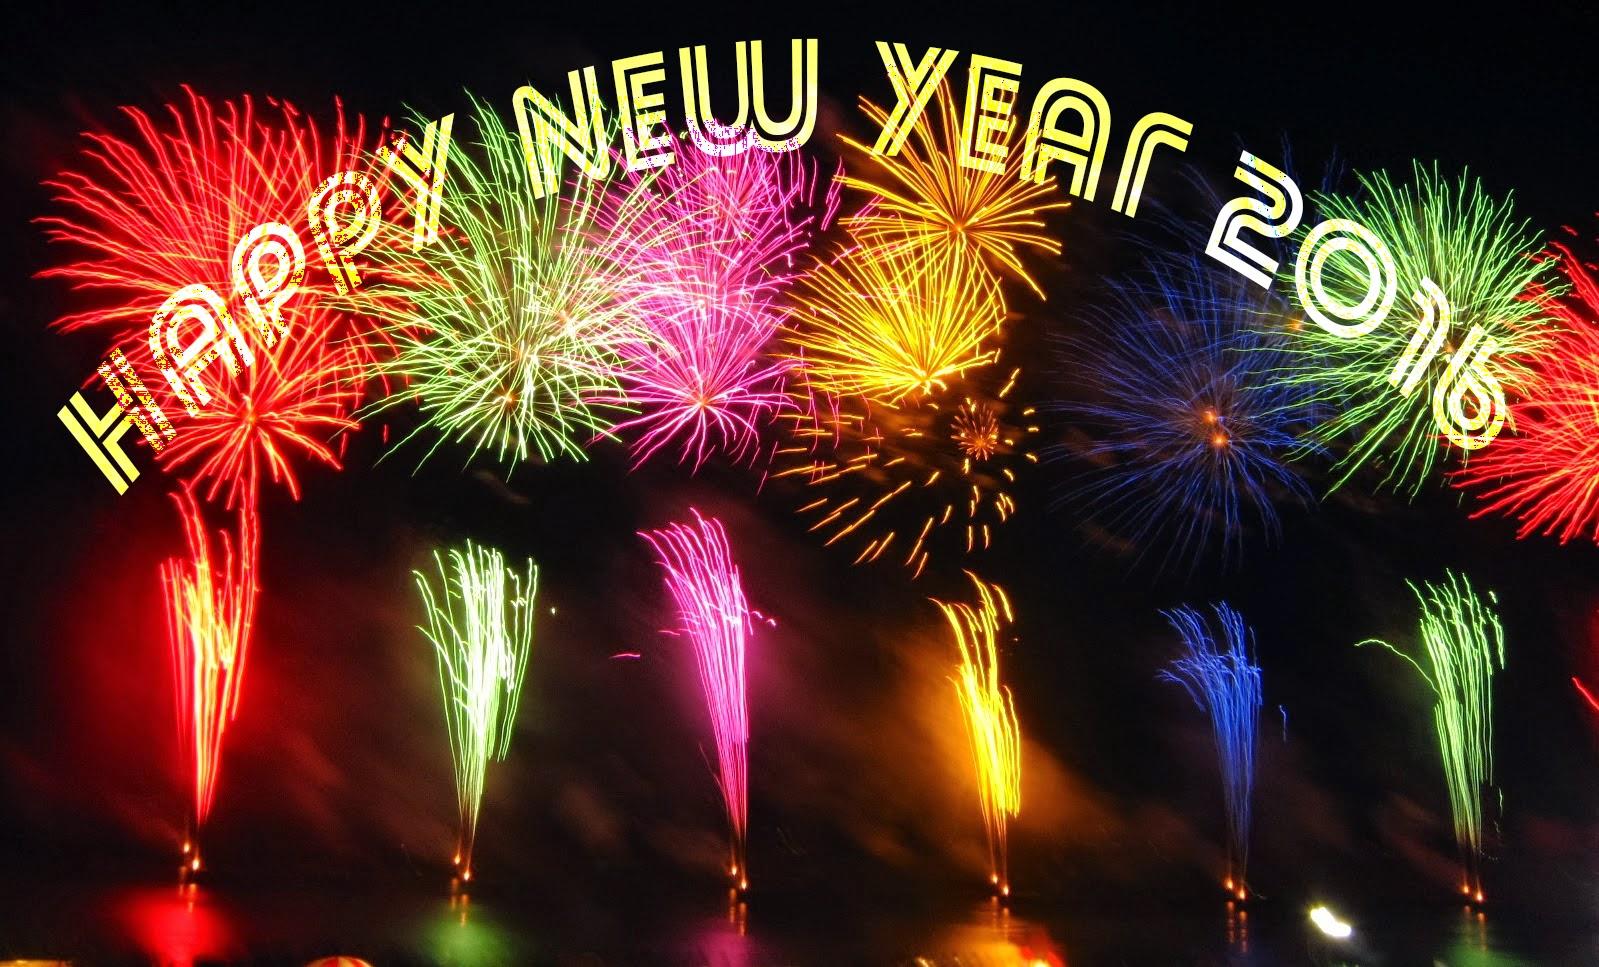 Happy New Year 2016 HD Wallpaper 17182 Wallpaper computer best 1599x967